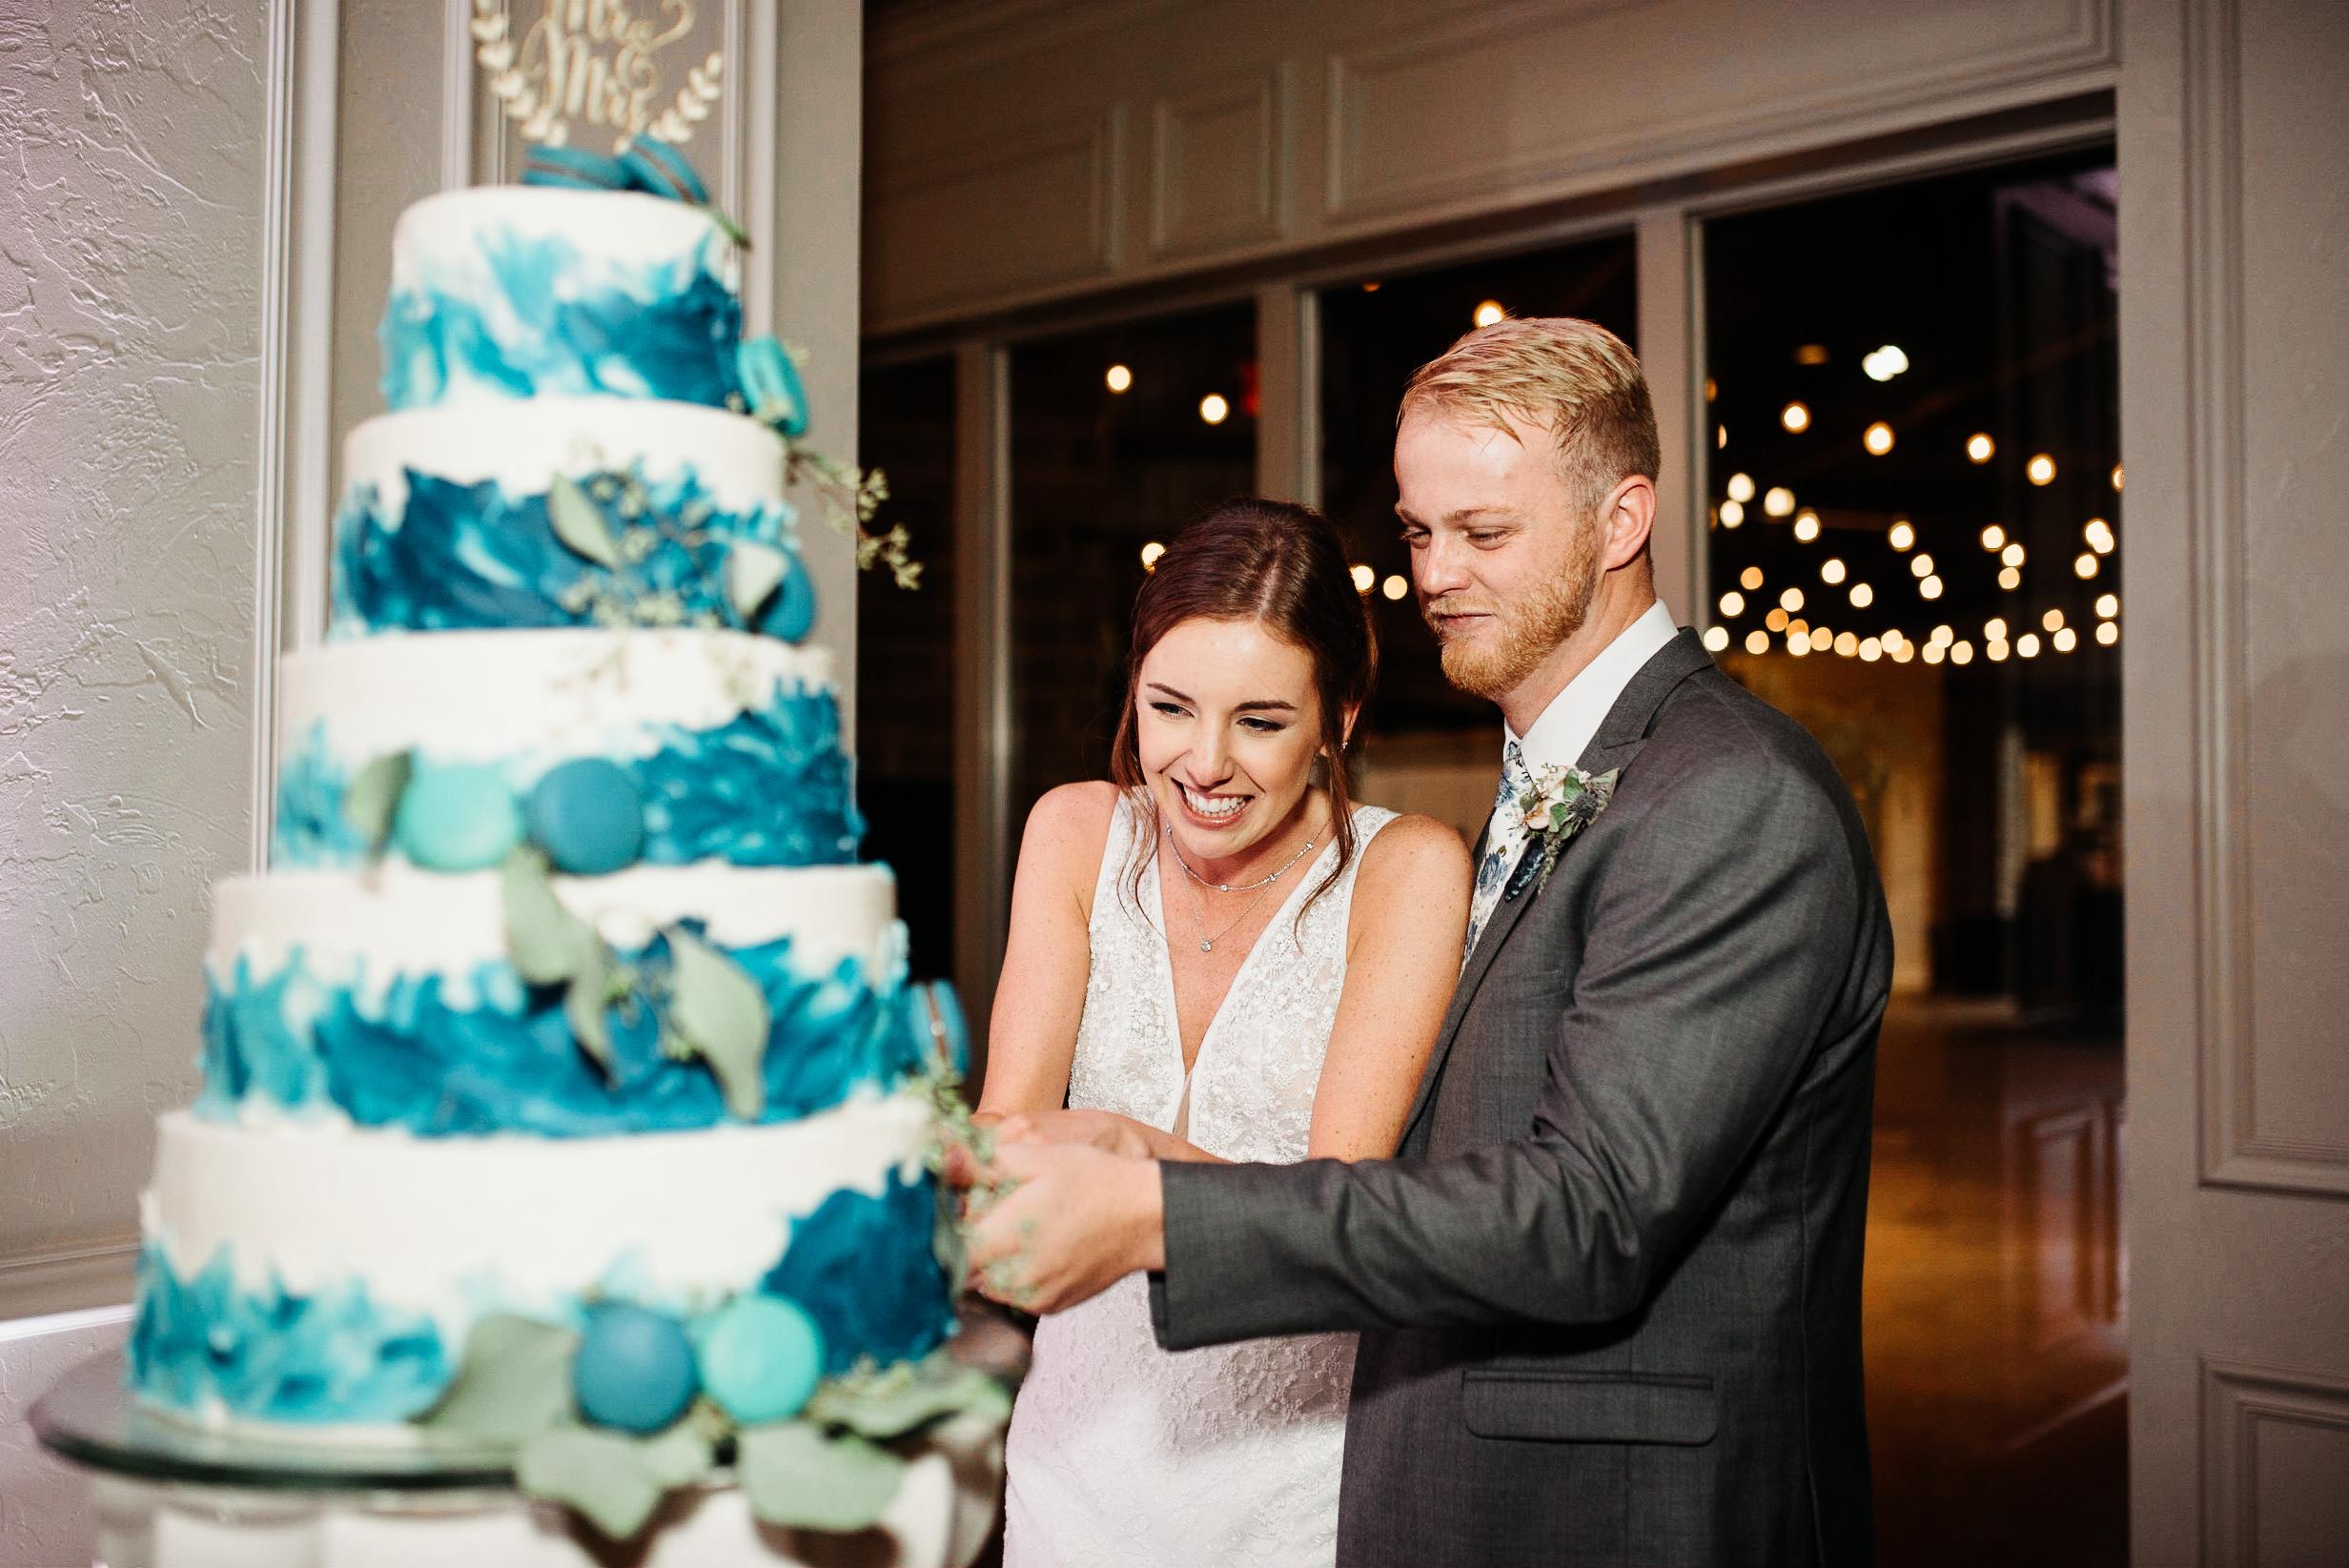 okc-wedding-photographer-coles-garden-wedding-okc-best-wedding-photographers-162.jpg